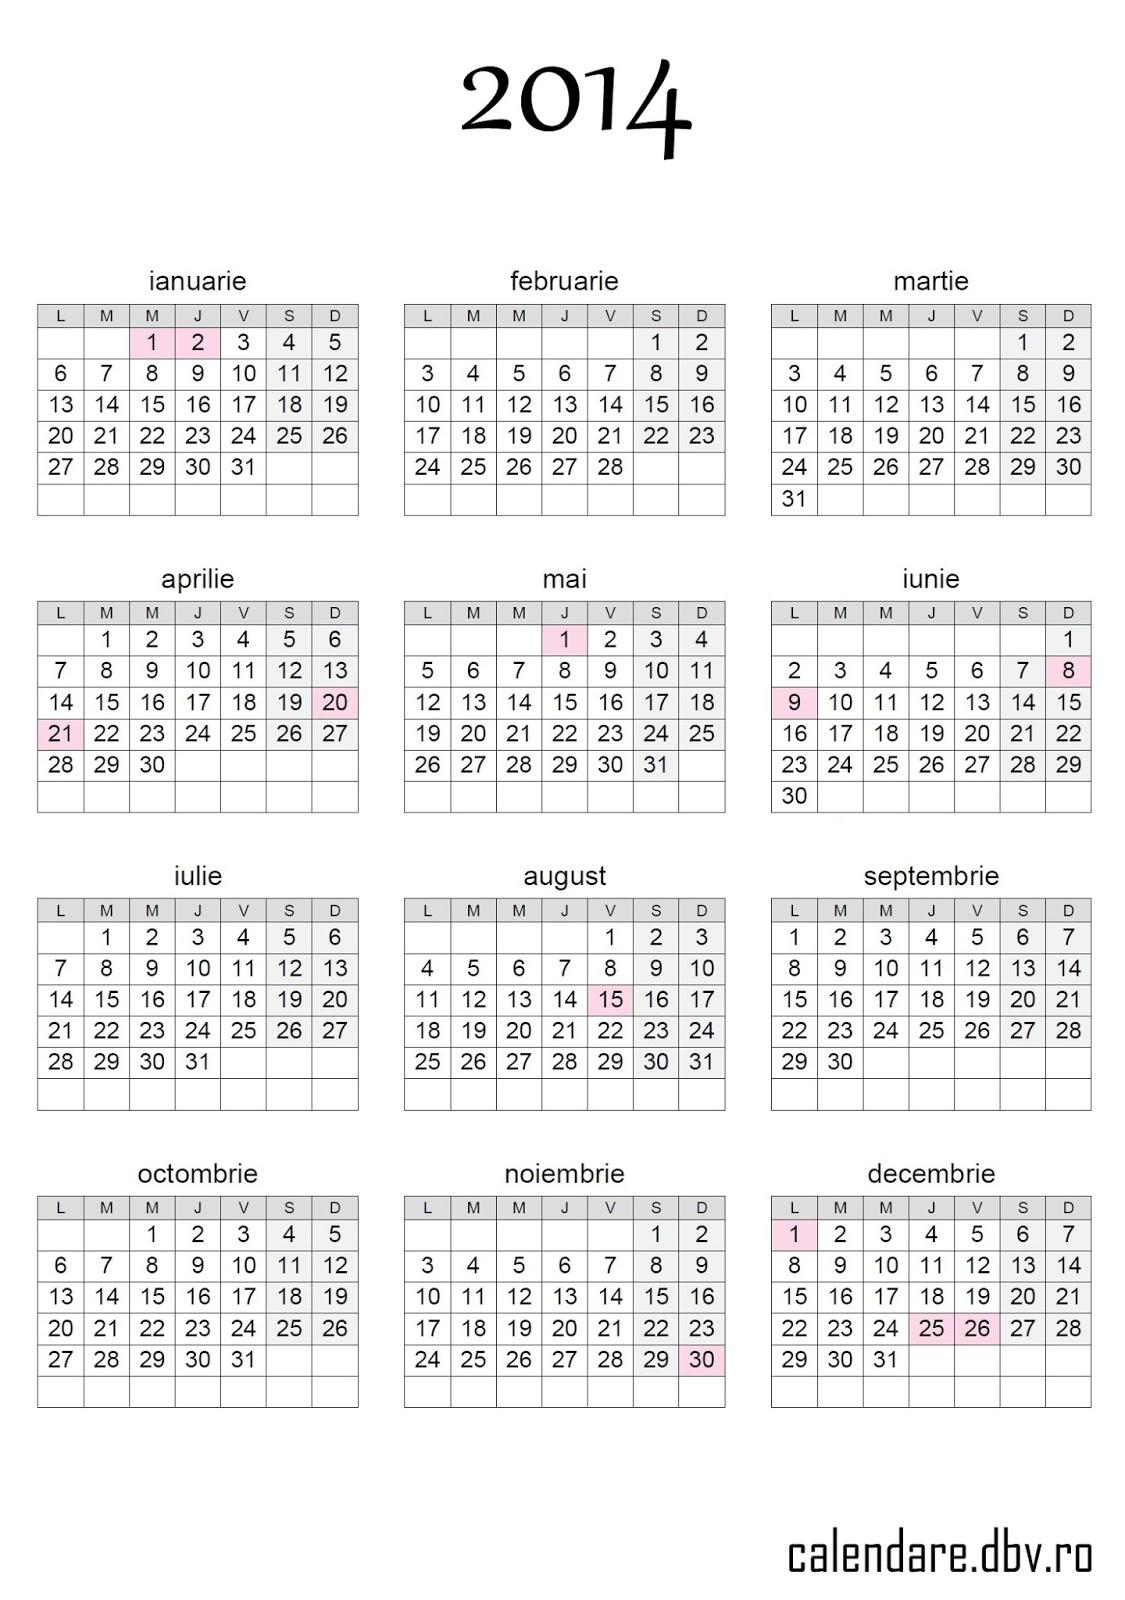 Calendar Românesc 2014 - 7